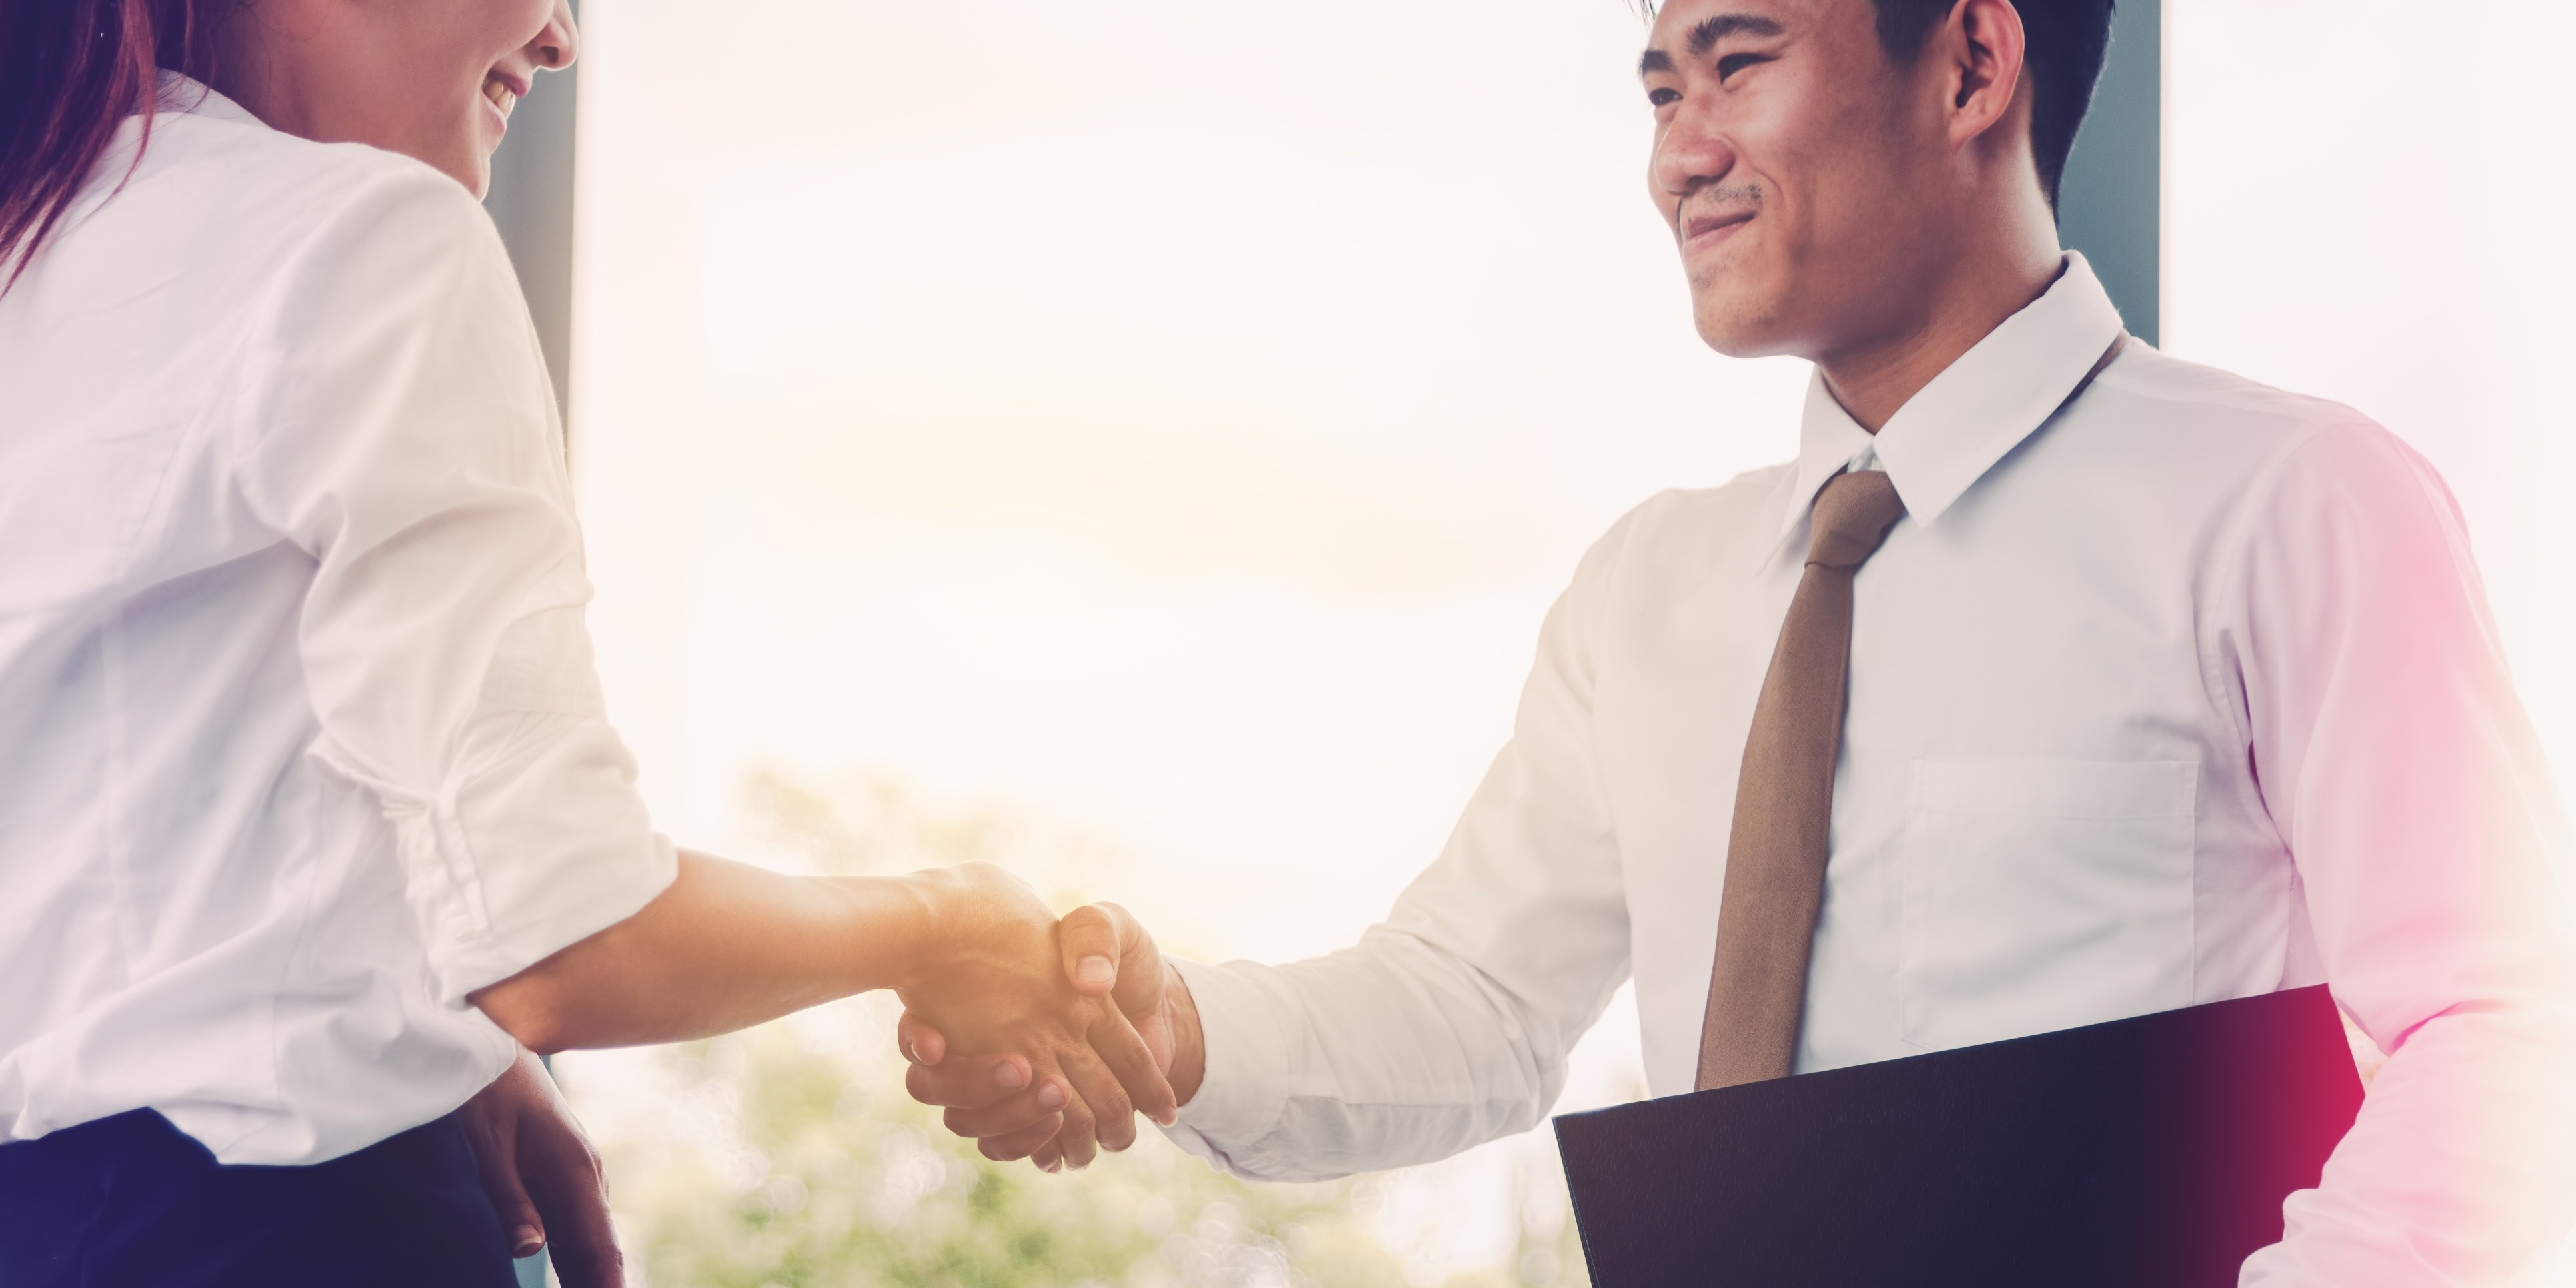 onboarding plans when hiring salespeople